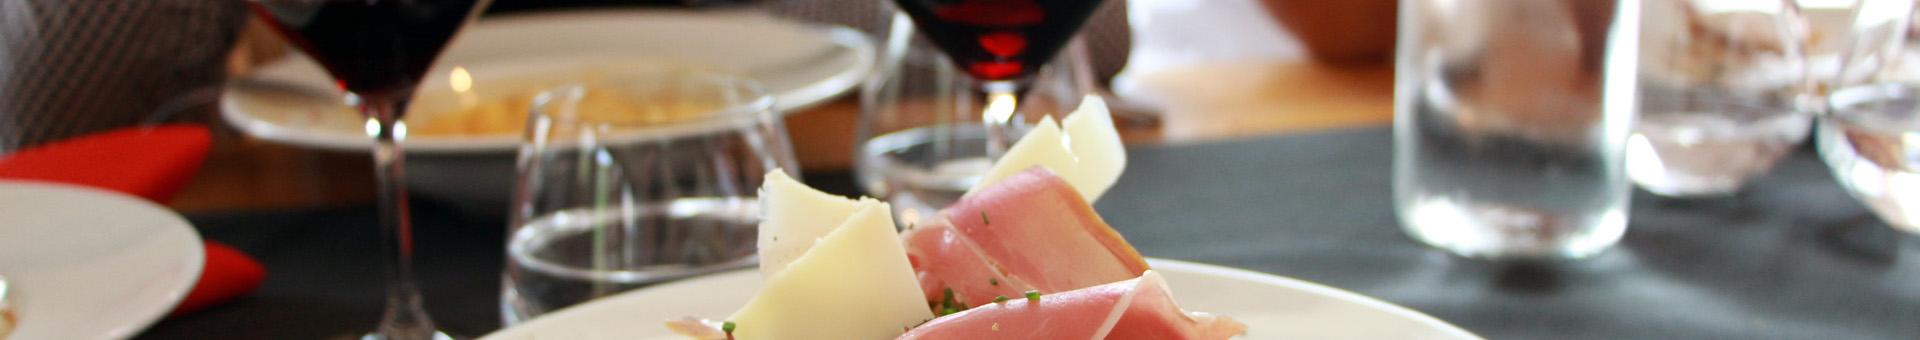 restaurants-zomer-saint-jean-d-arves